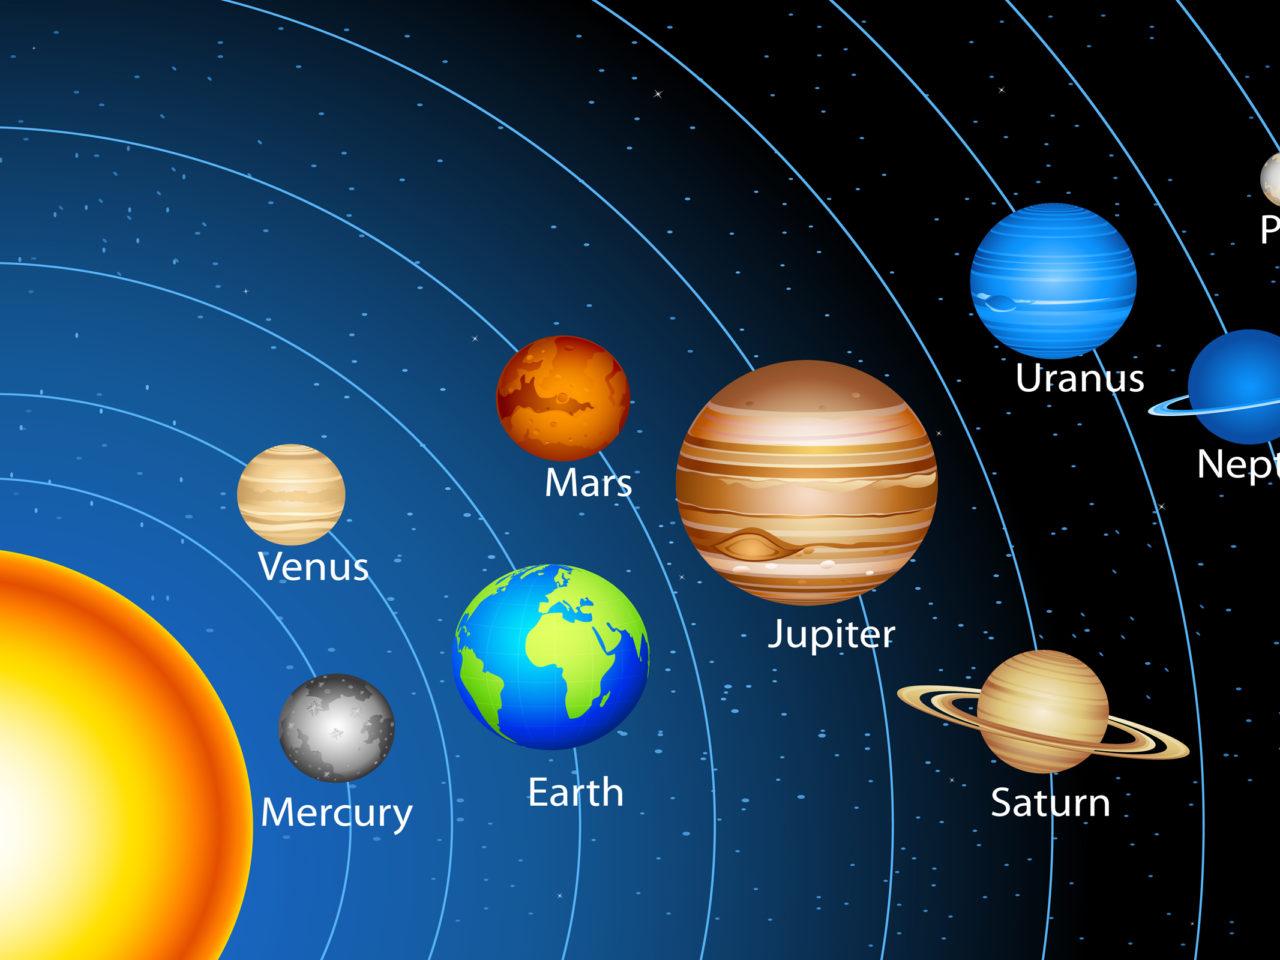 Nebula Wallpaper Hd Planets And Solar System Hd Wallpaper 9877 Wallpapers13 Com